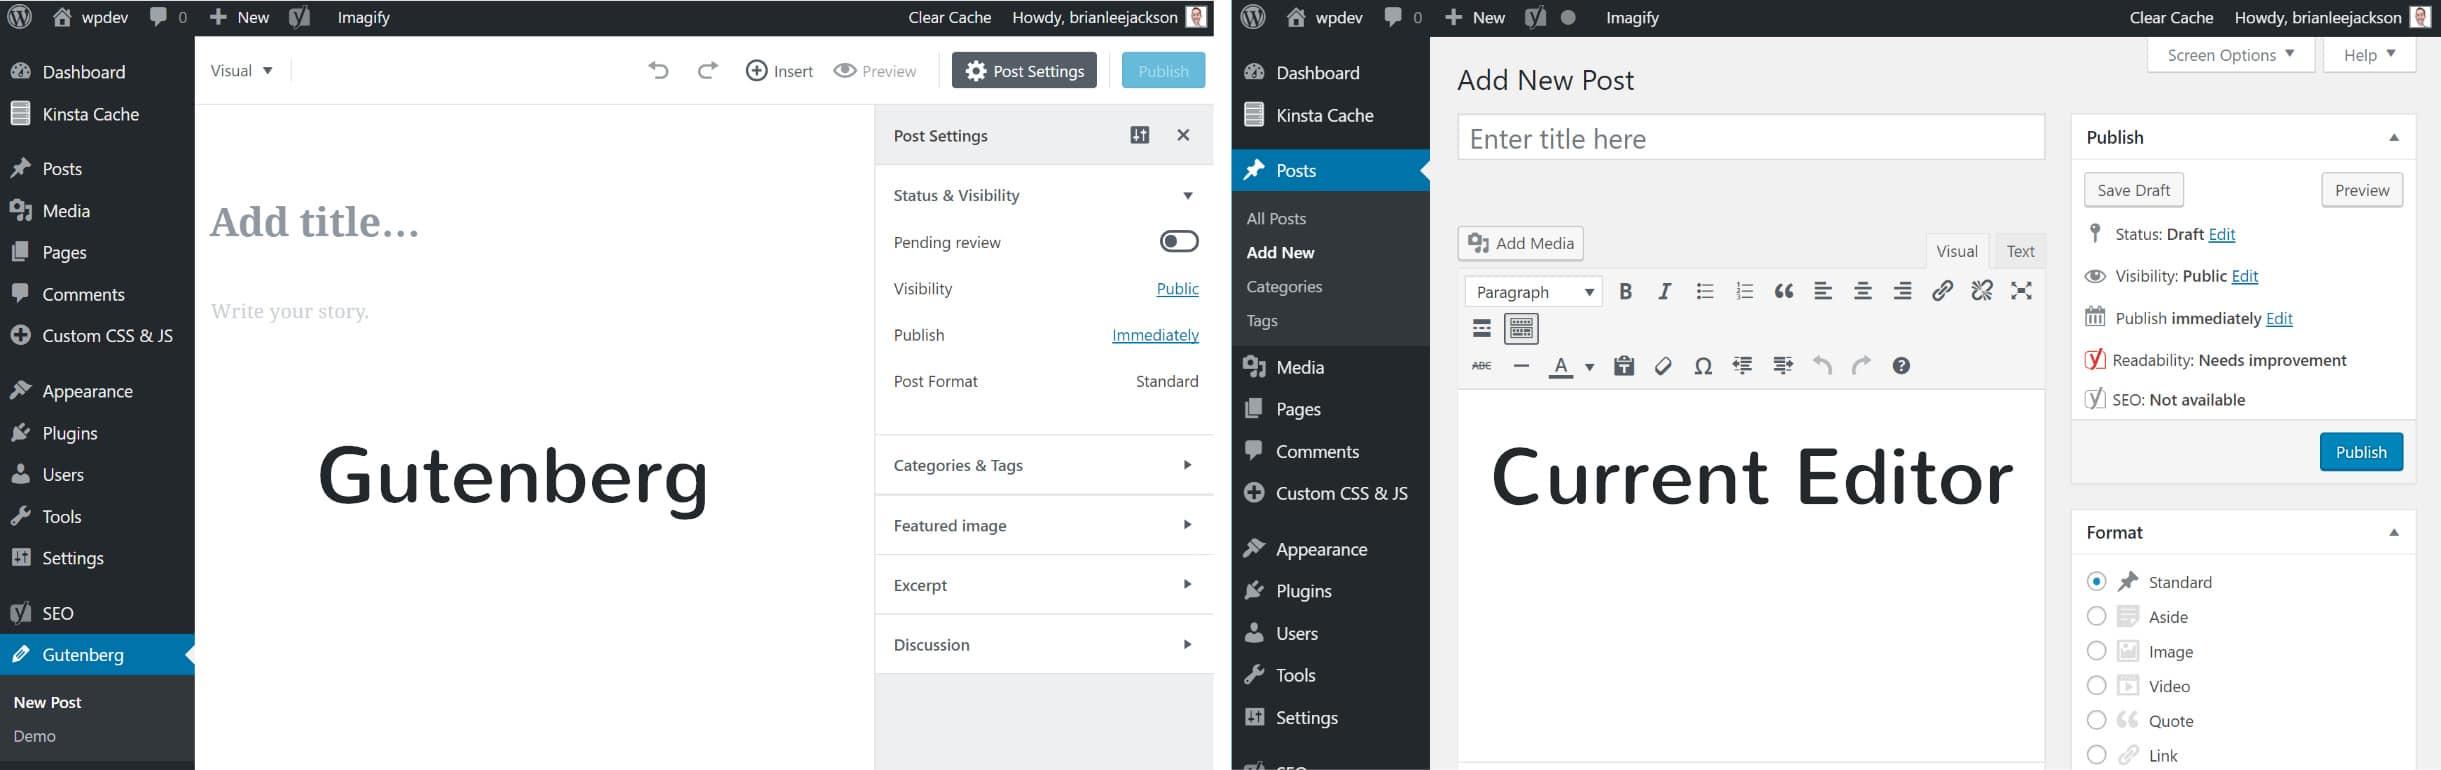 Comparing Gutenbergエディタと現在のビジュアルエディタの比較